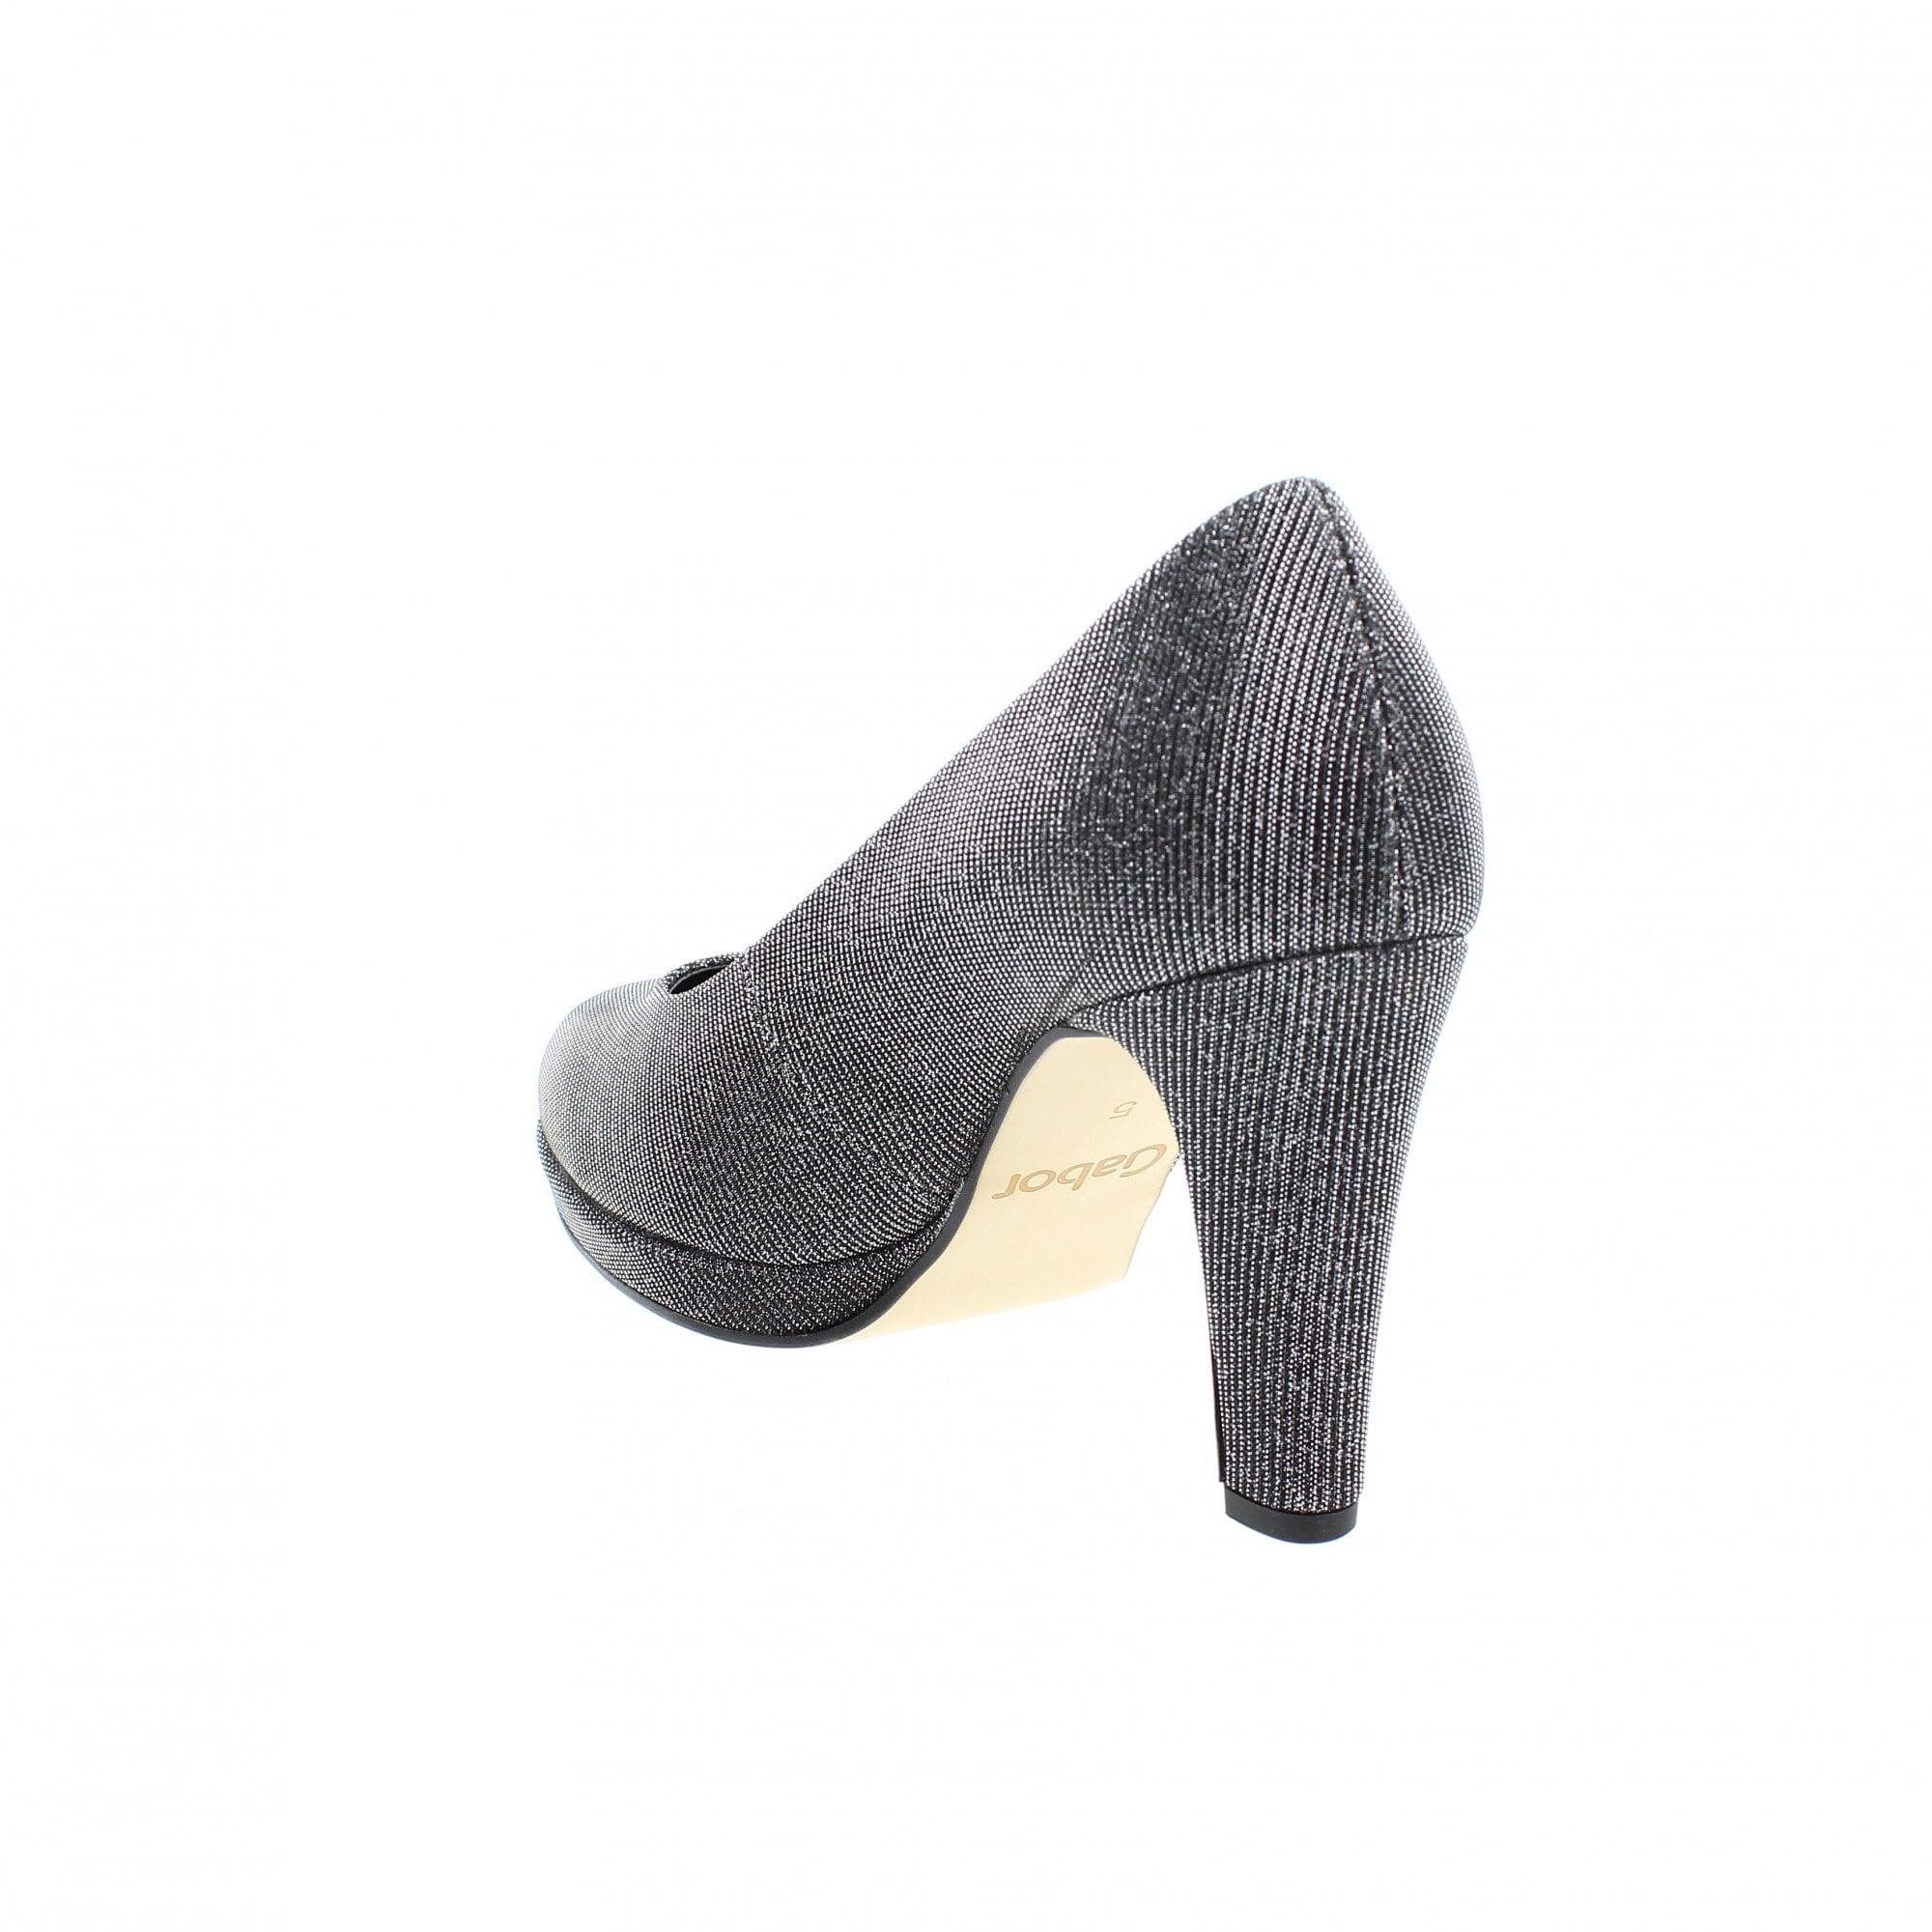 21dfcf909 Gabor Splendid 91-270-69 Pewter/Silver Court Shoes   Rogerson Shoes